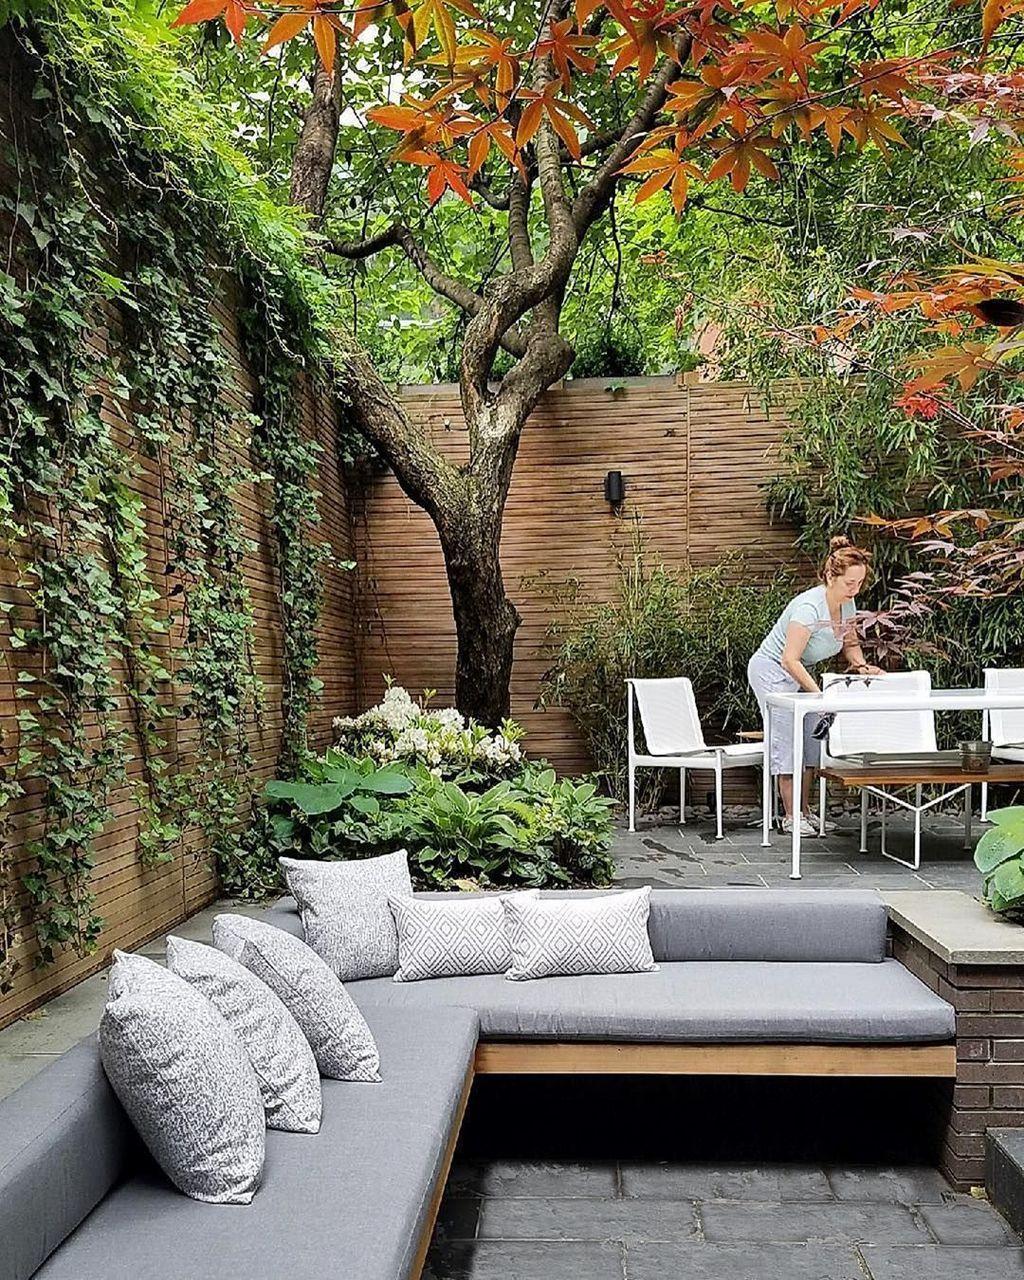 30 gorgeous small backyard landscaping ideas small on gorgeous small backyard landscaping ideas id=62653